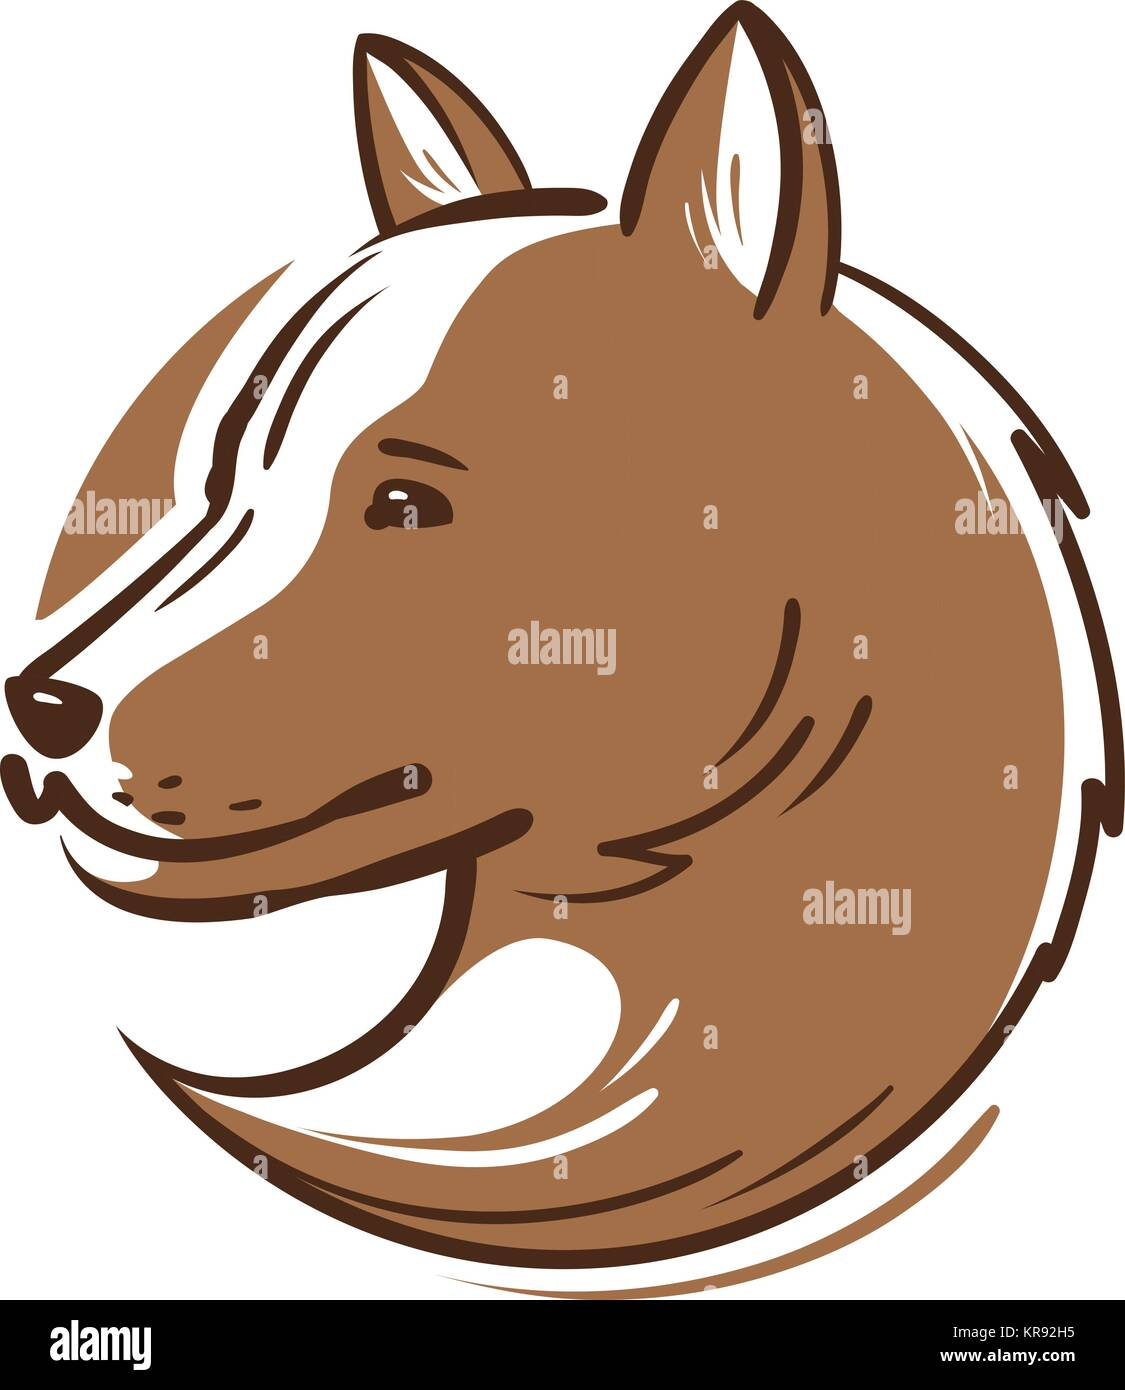 Dog Logo Or Icon Animal Pet Puppy Wolf Emblem Vector Stock